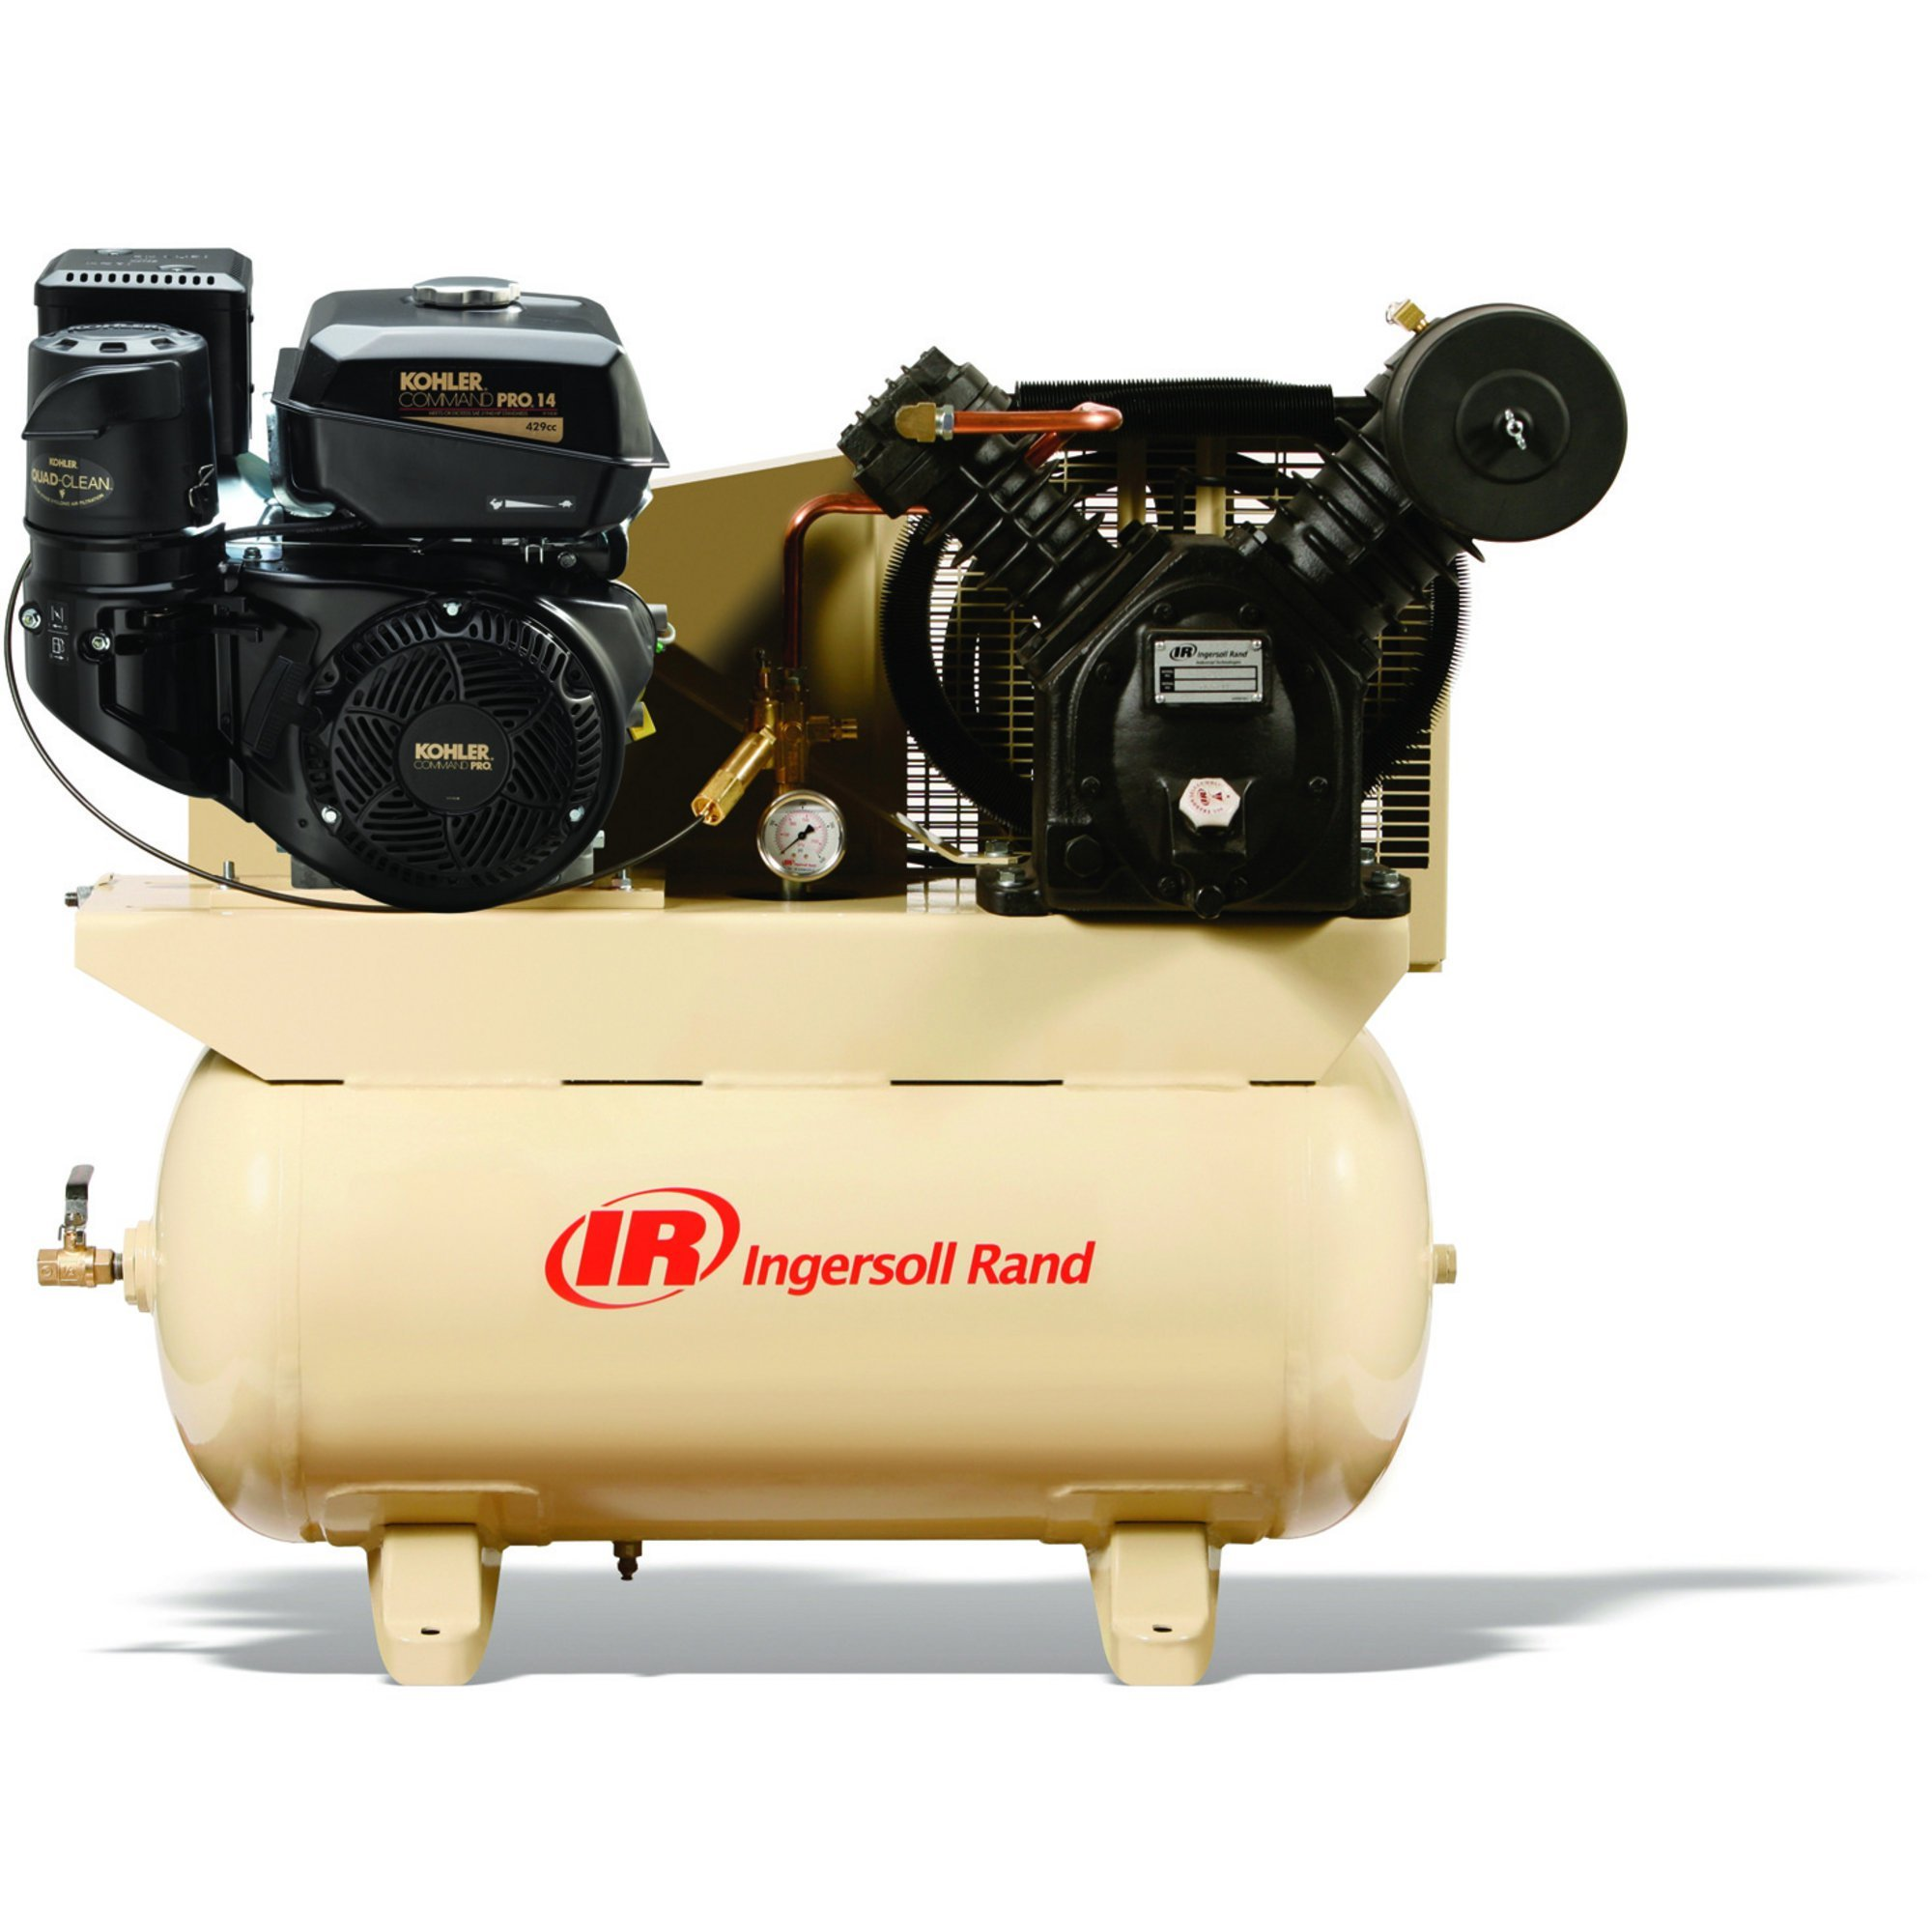 kohler mand racing parts daikin split air conditioner wiring diagram 14 hp gas powered compressor ingersoll rand 2475f14g